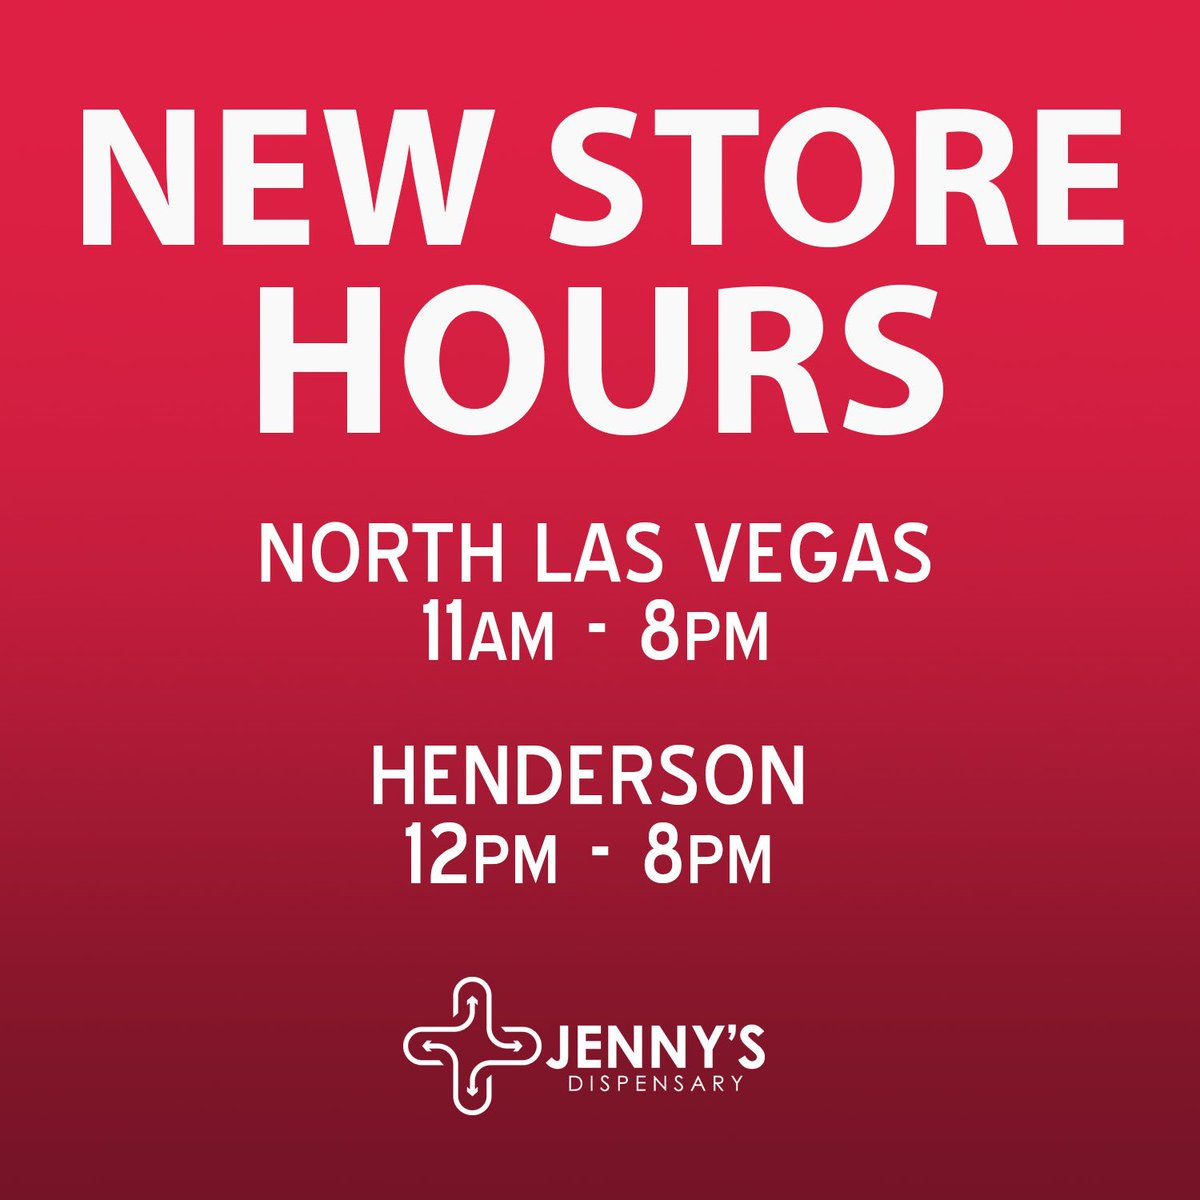 Jenny's Dispensary North Las Vegas Cannabis